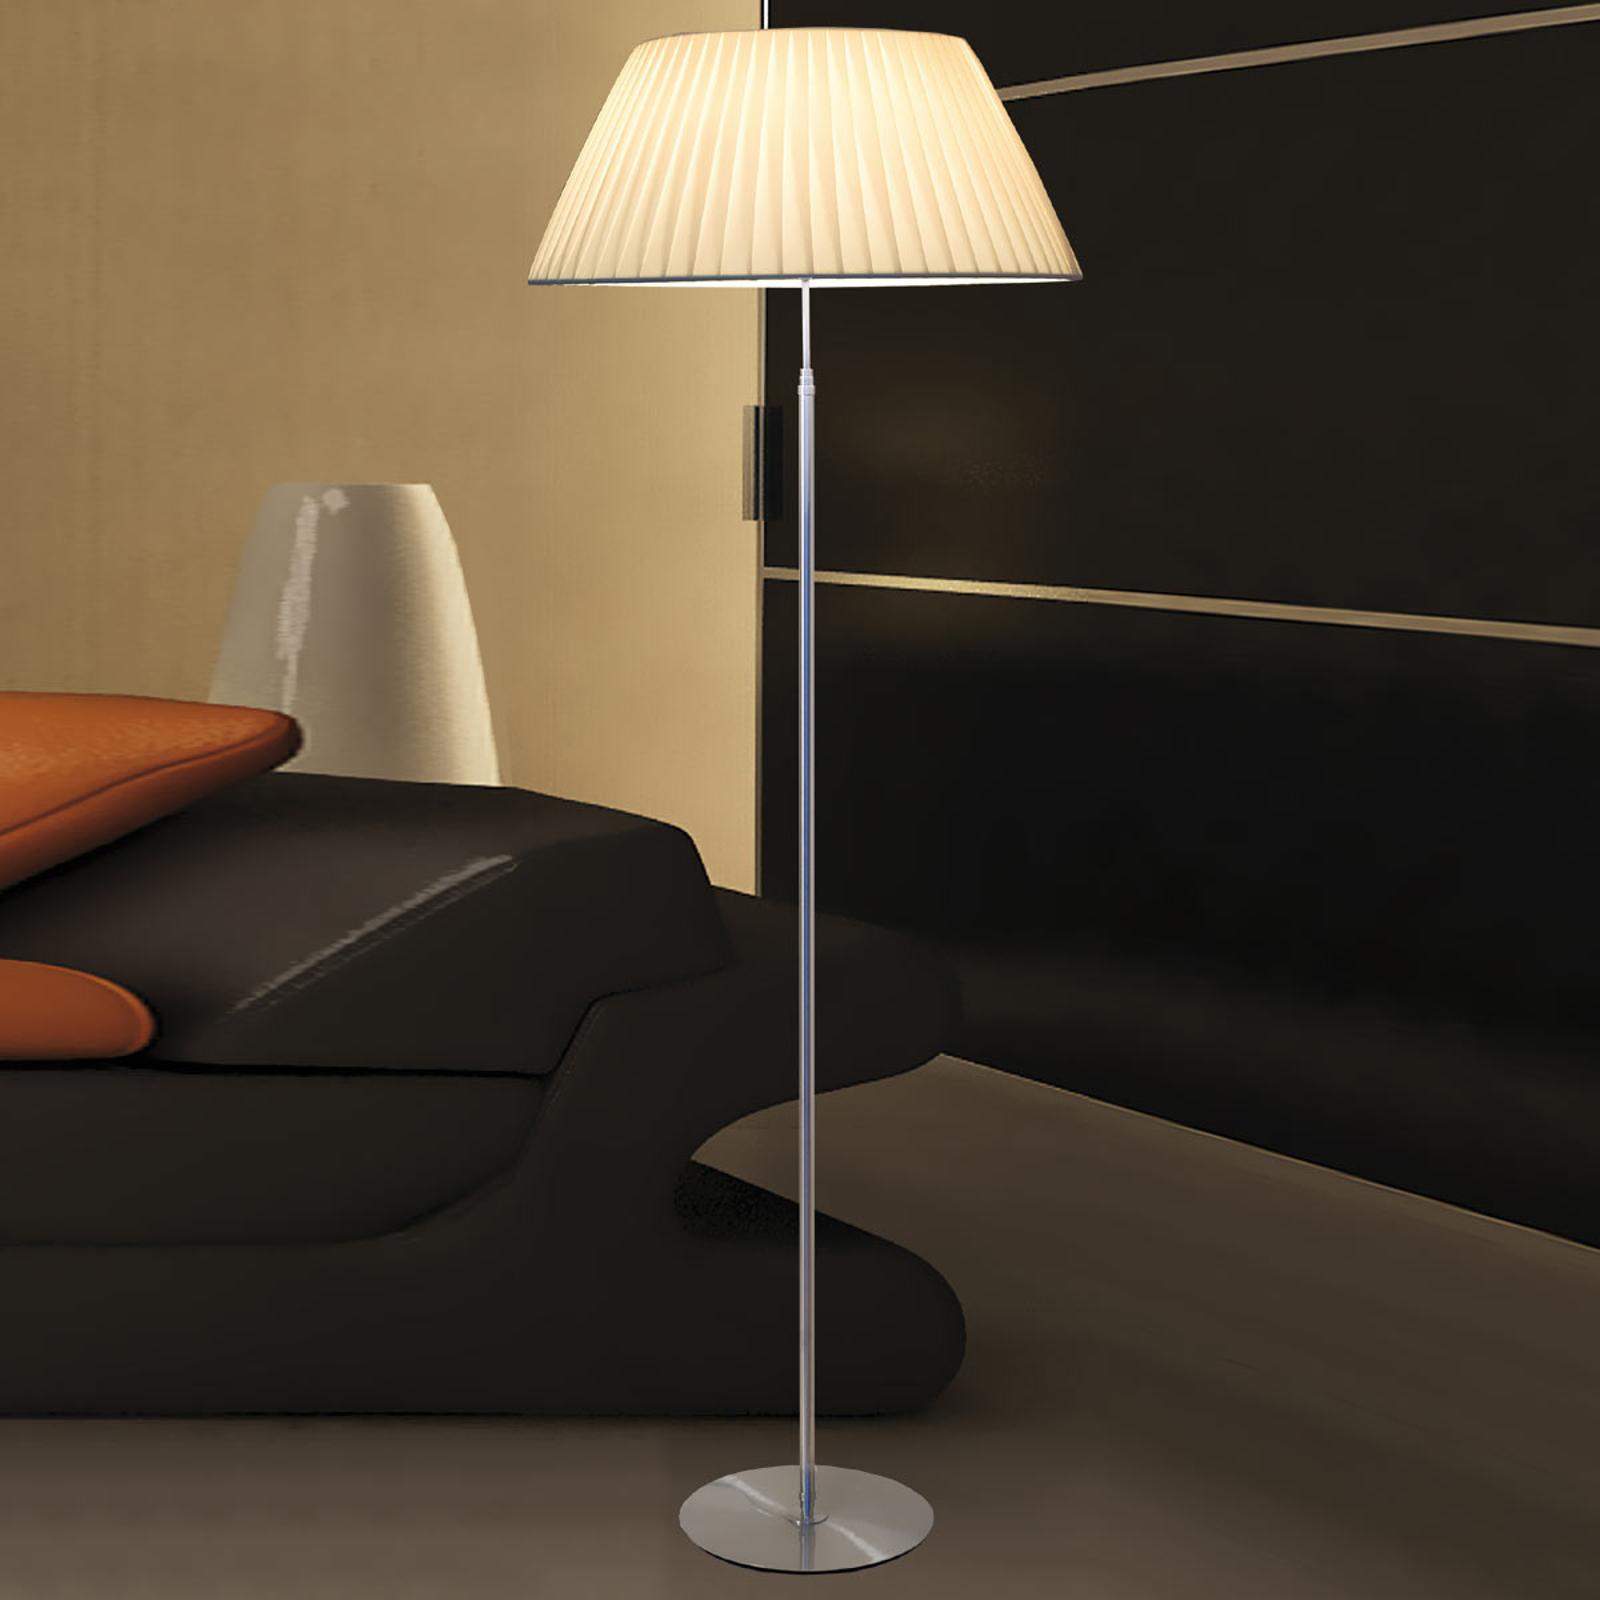 Smukła lampa stojąca Clara